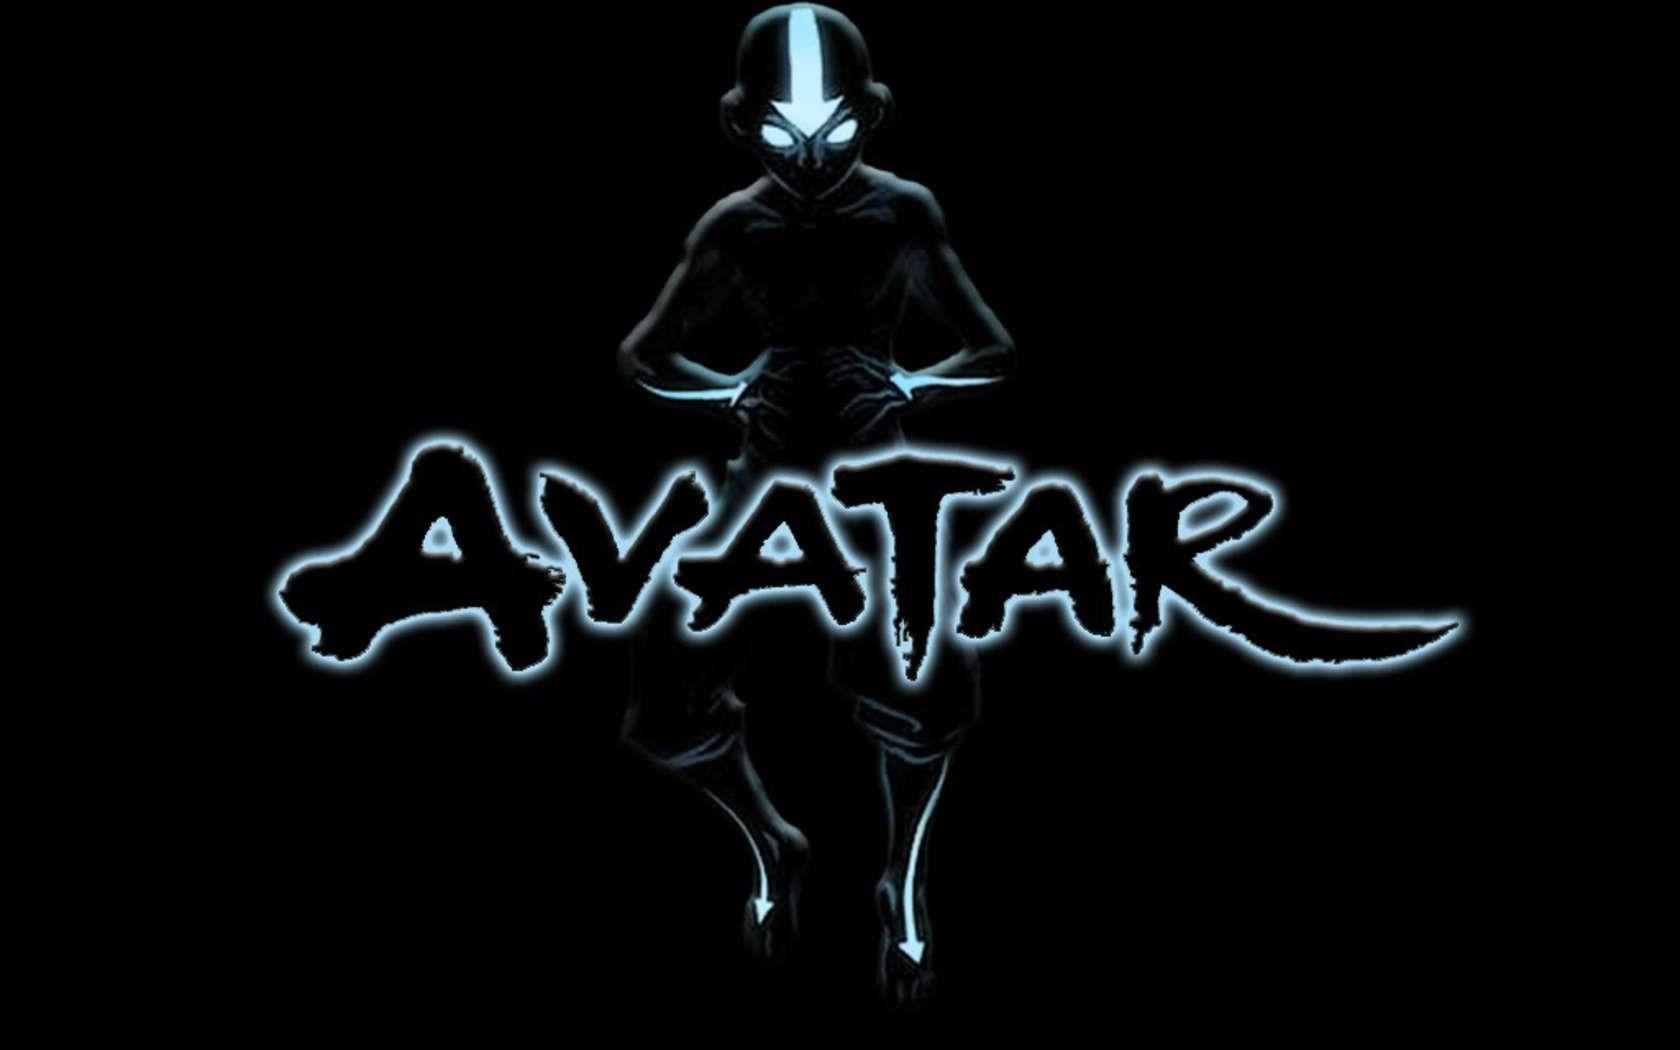 Avatar Aang Wallpapers Wallpaper Cave